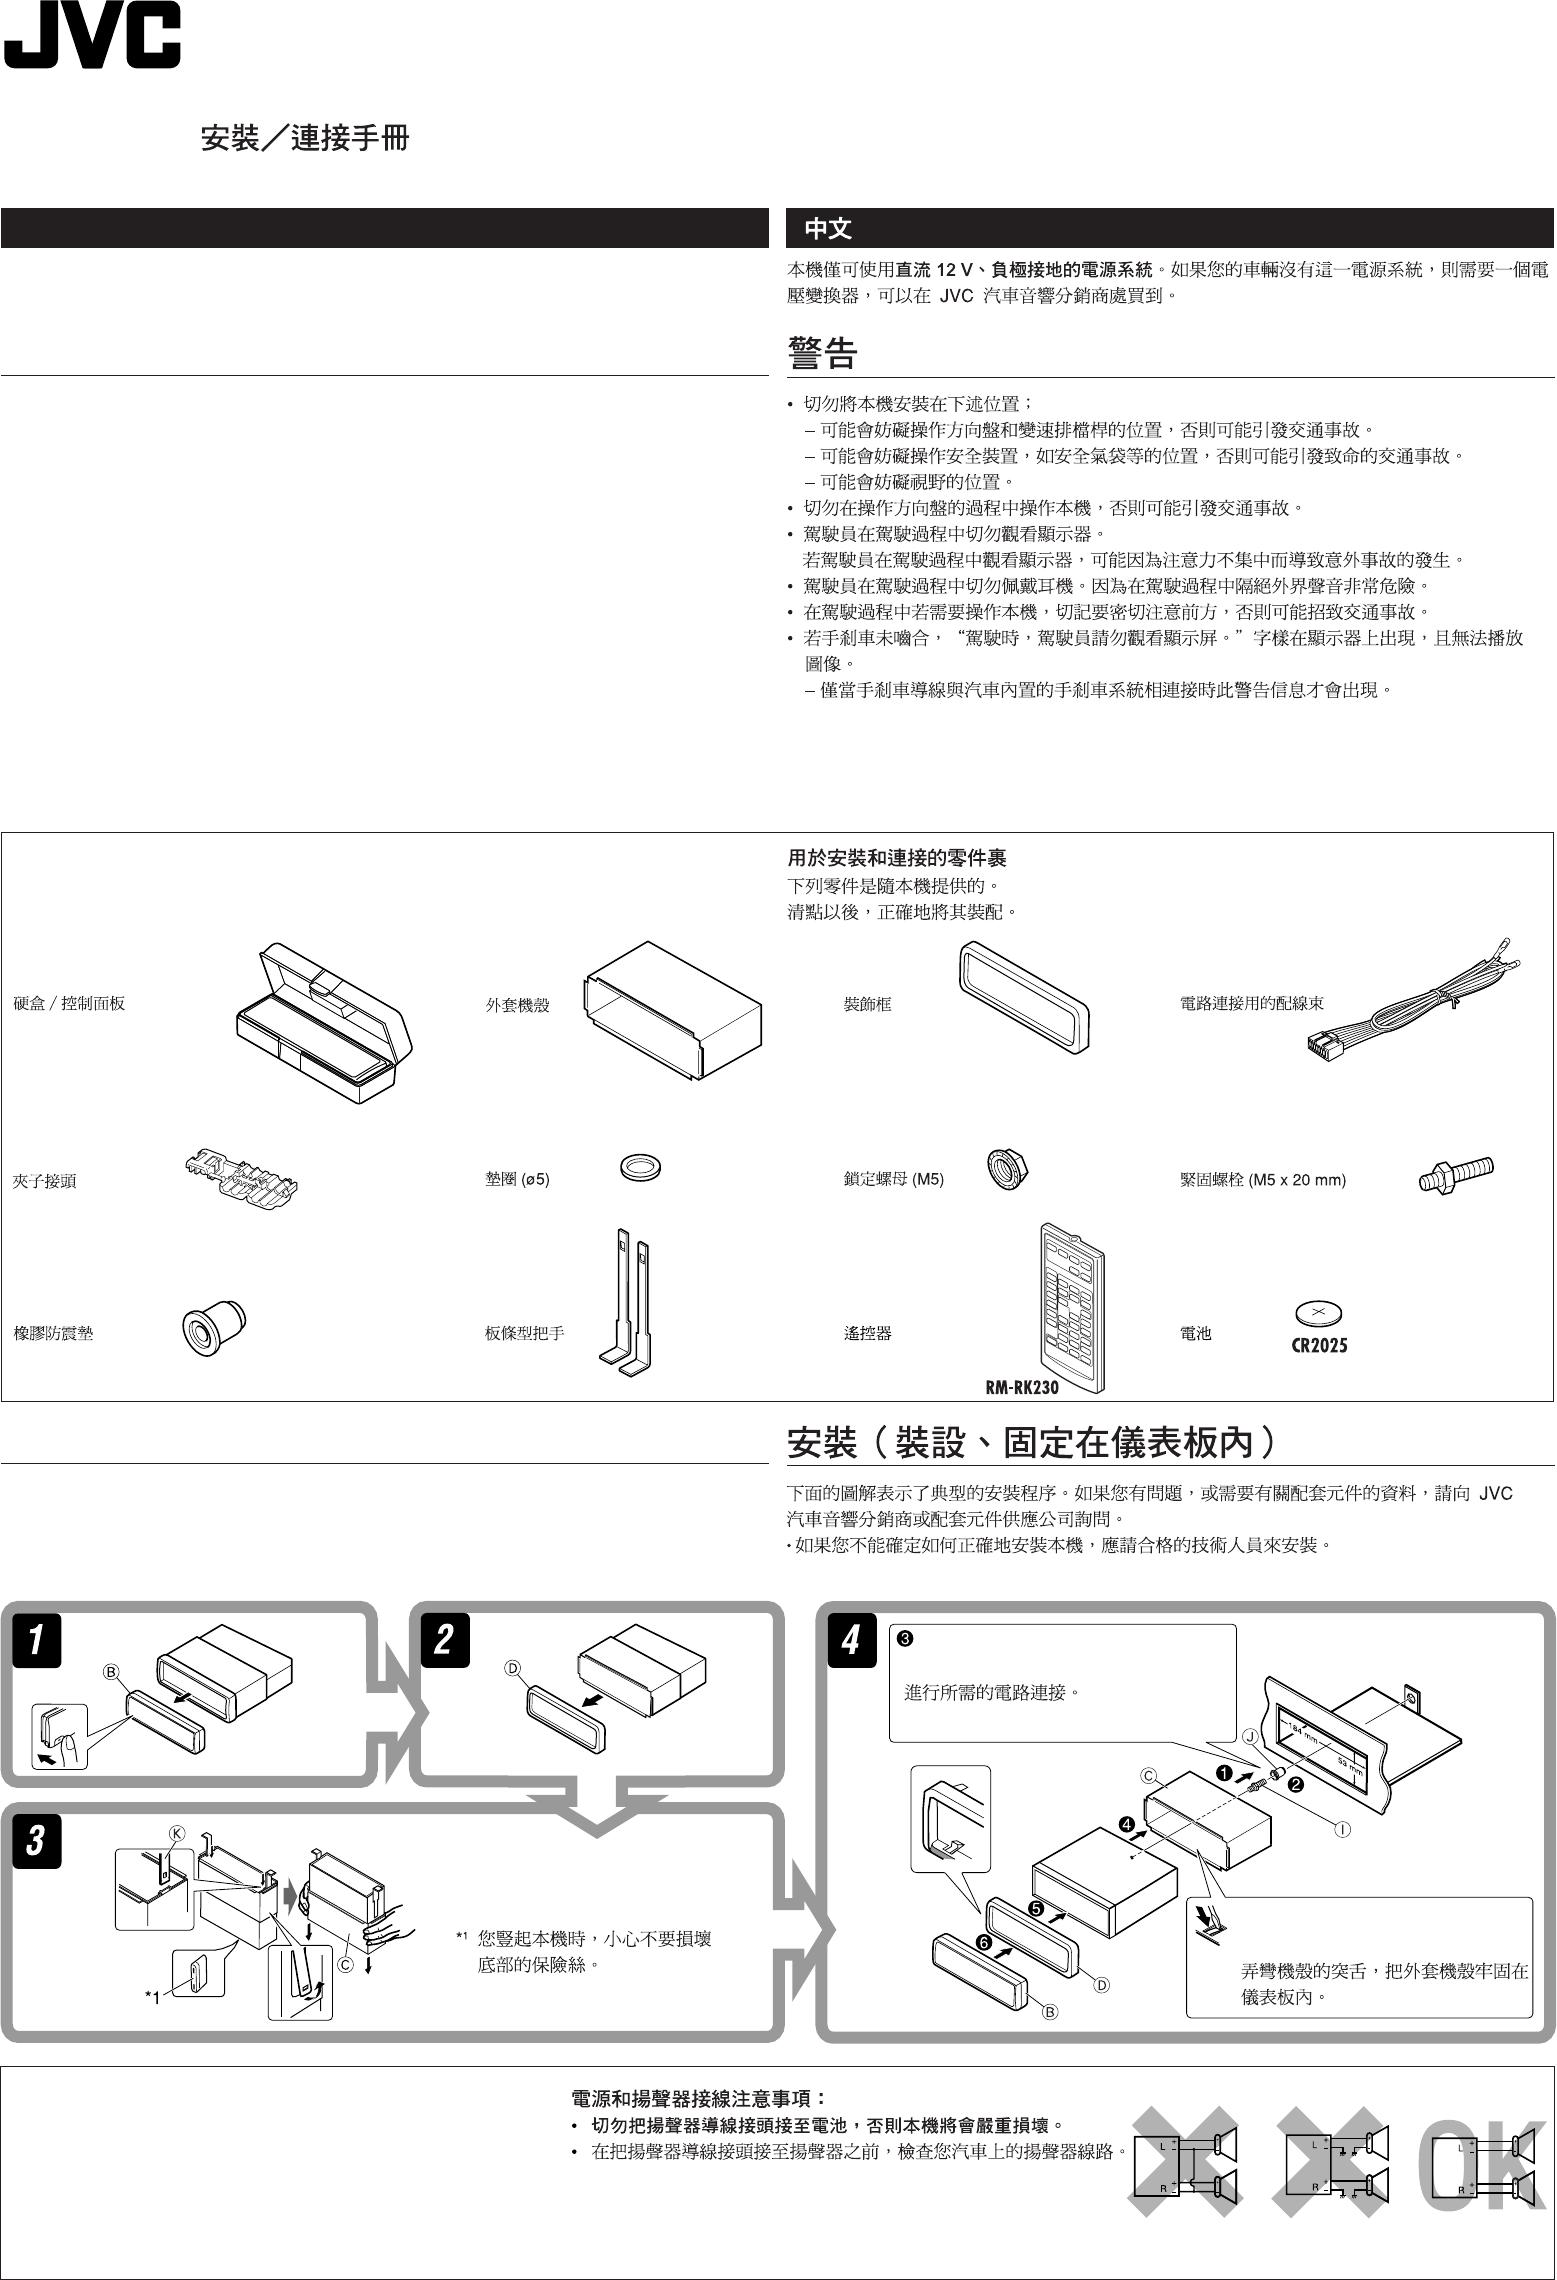 Jvc Kd Dv5105u Instal1 2 Dv6108 004a User Manual Dv5105ut Kw V1 0 Wiring Diagram Installation Get0278